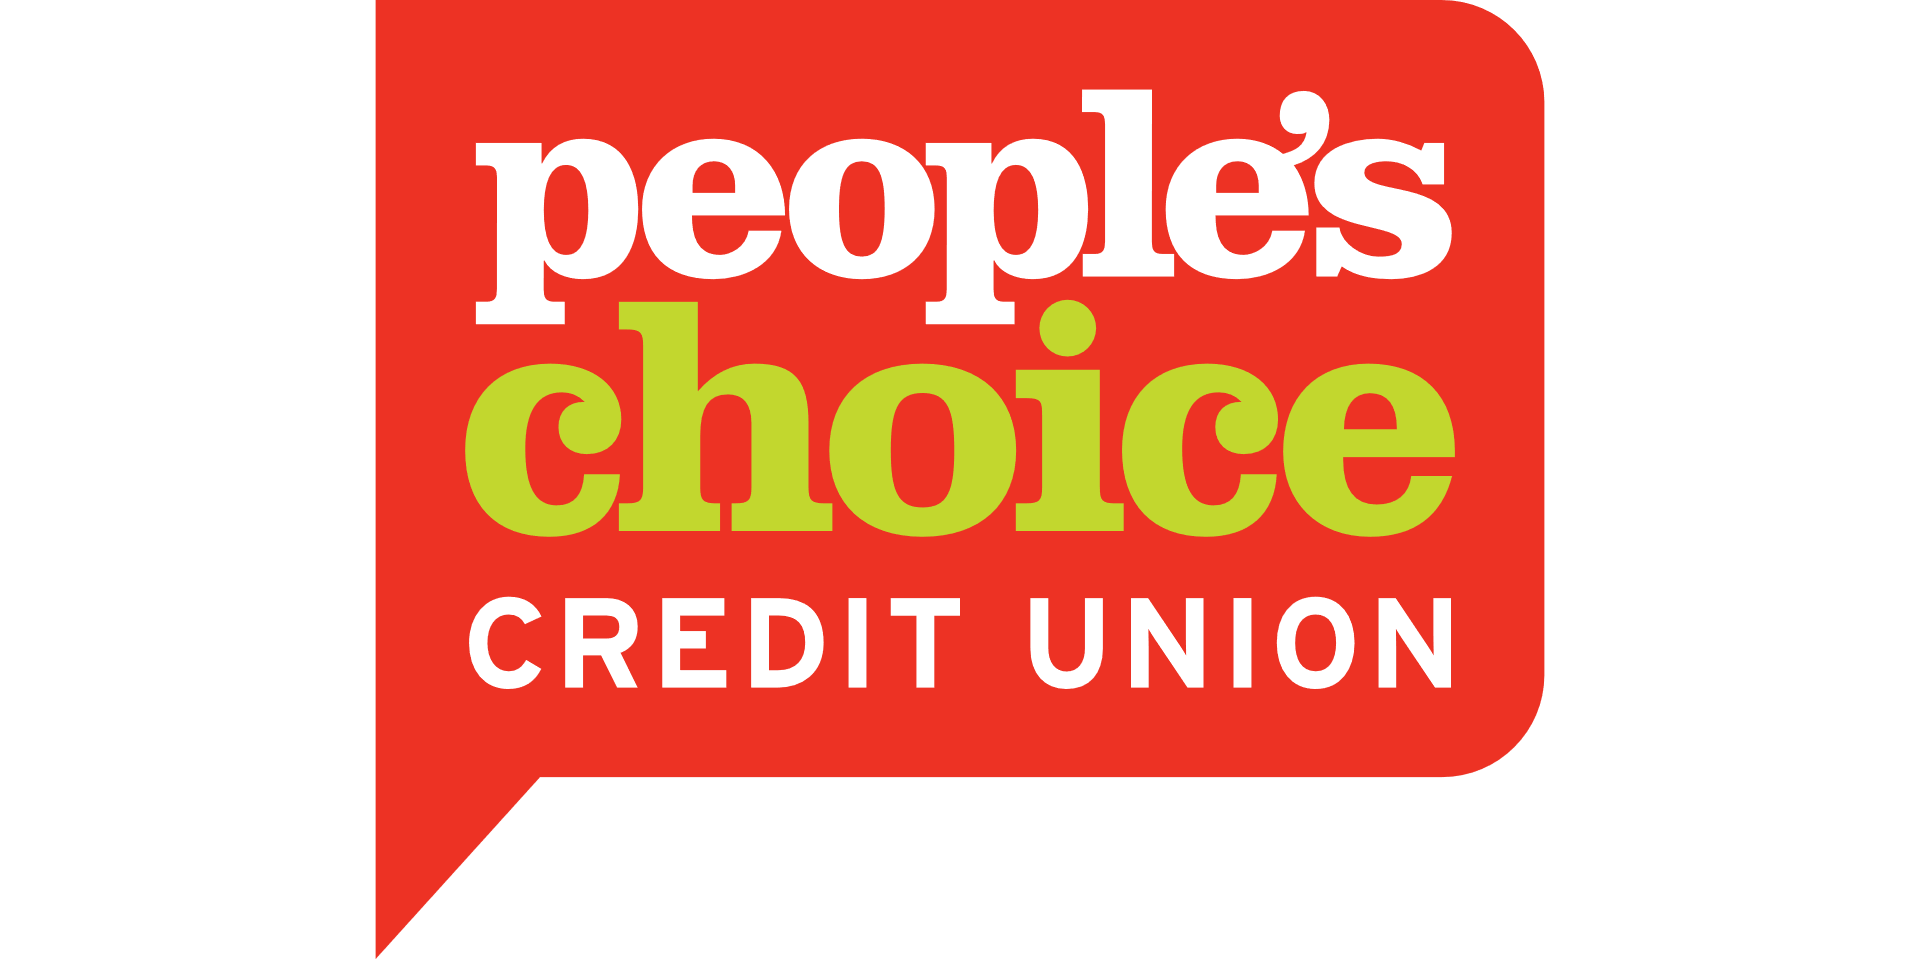 People's Choice Credit Union - Modbury, SA 5092 - (01) 3118 1182 | ShowMeLocal.com